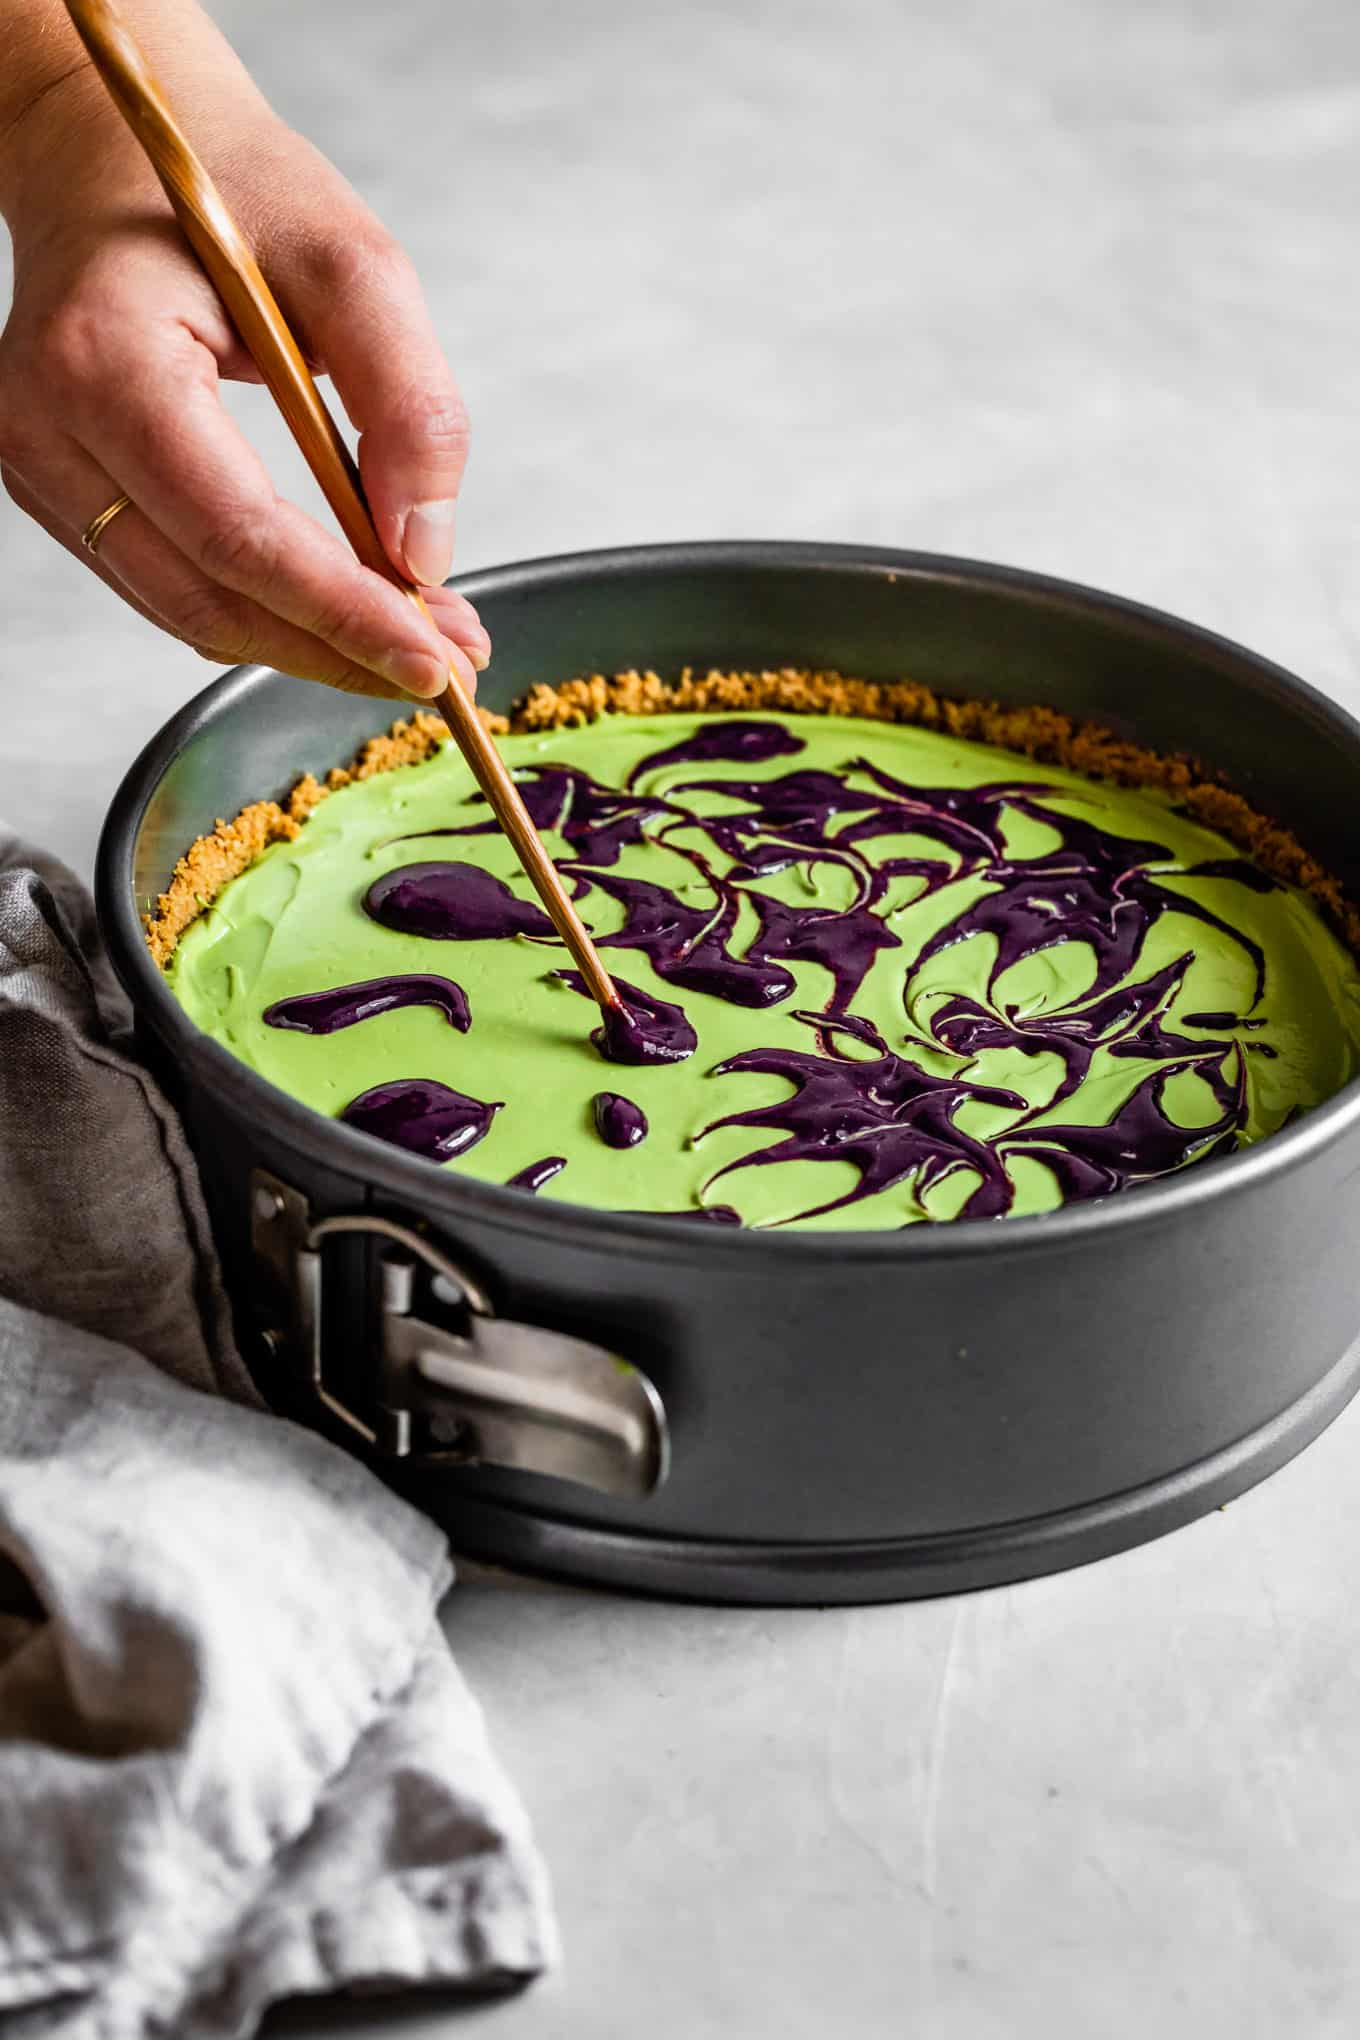 How to make swirls in a cheesecake